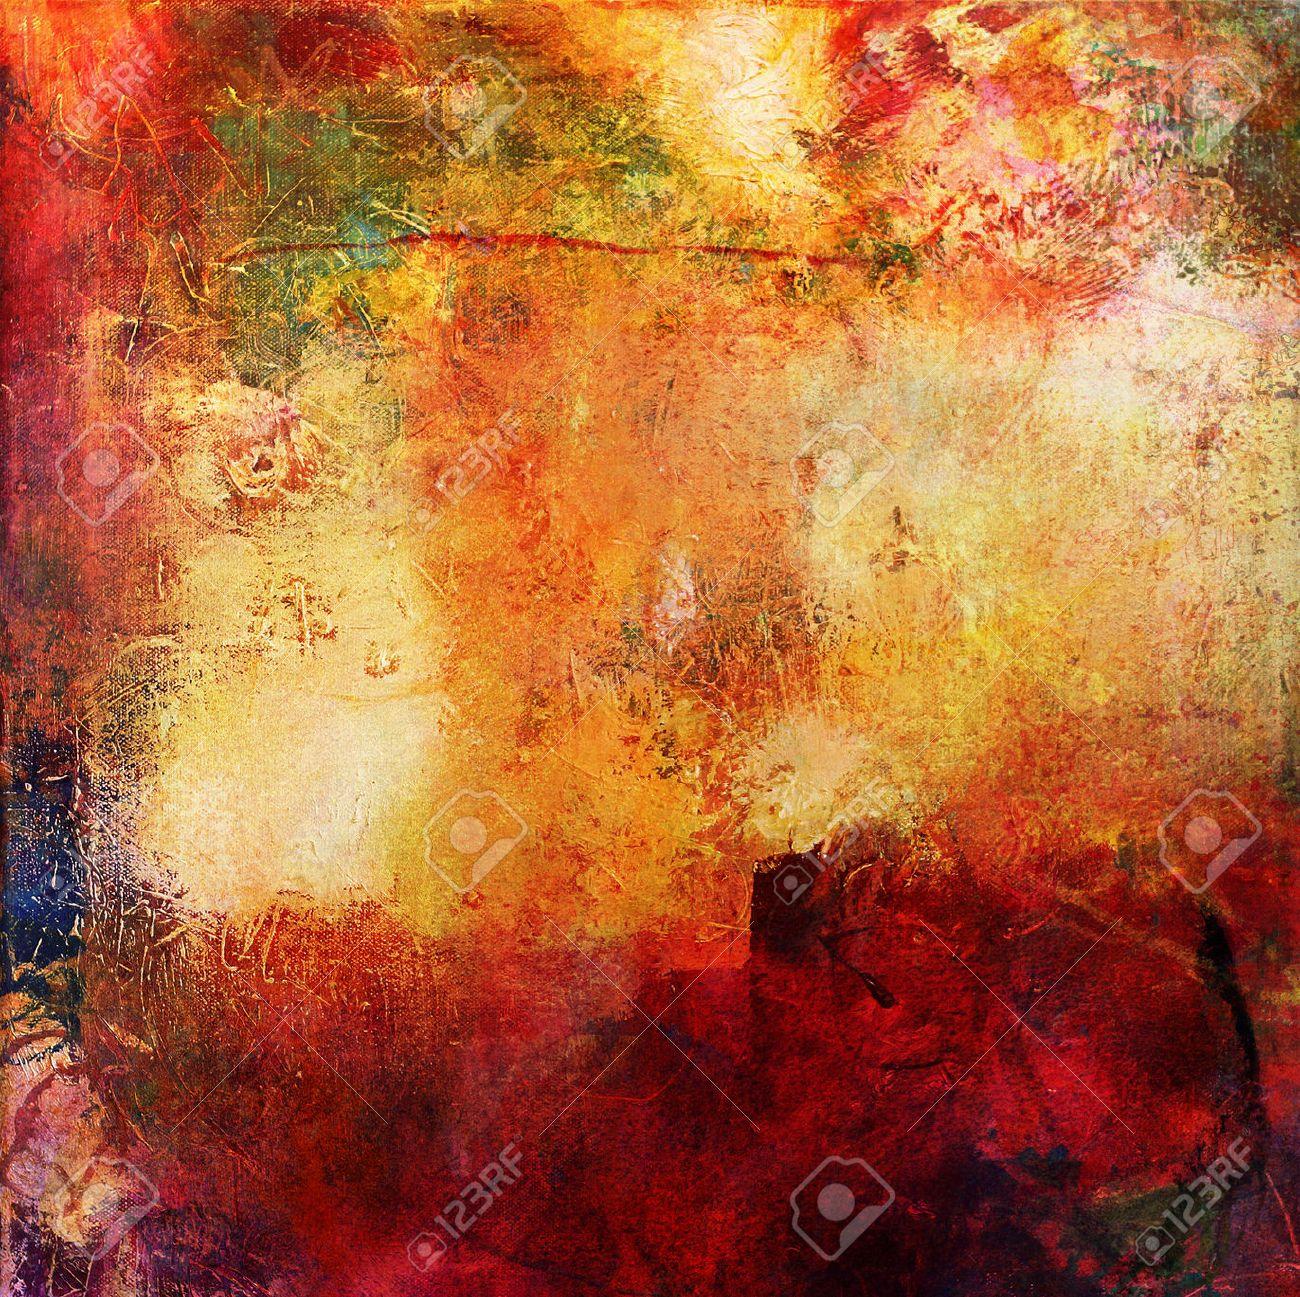 Abstraite Multicolore Couche ?uvre, Textures